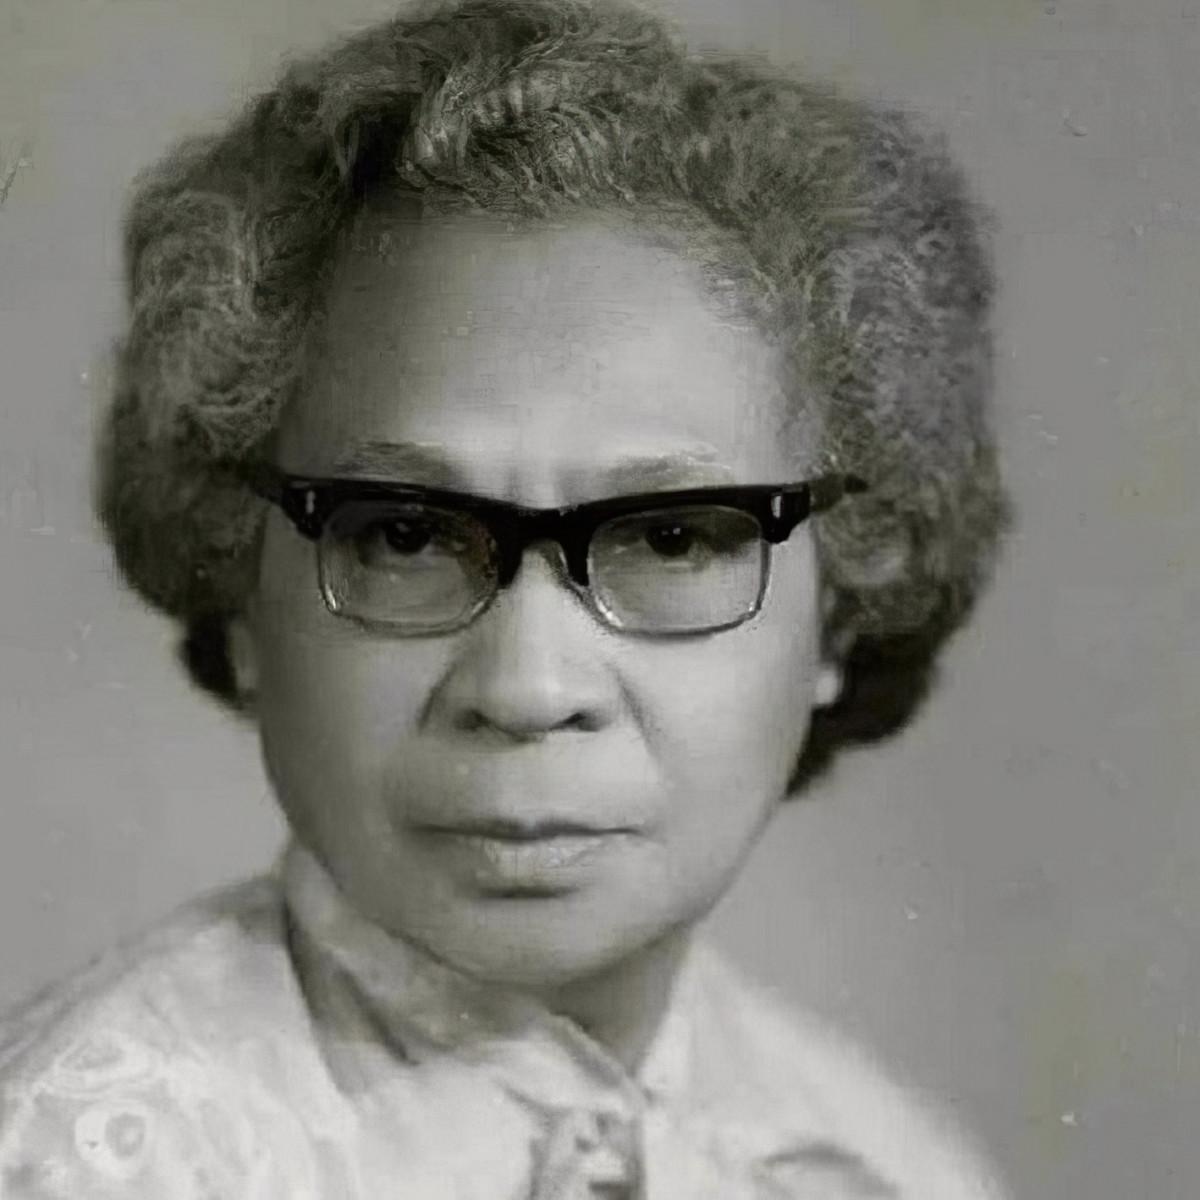 Mengenang Francisca Fanggidaej, Pejuang Kemerdekaan yang Terhapus dari Sejarah